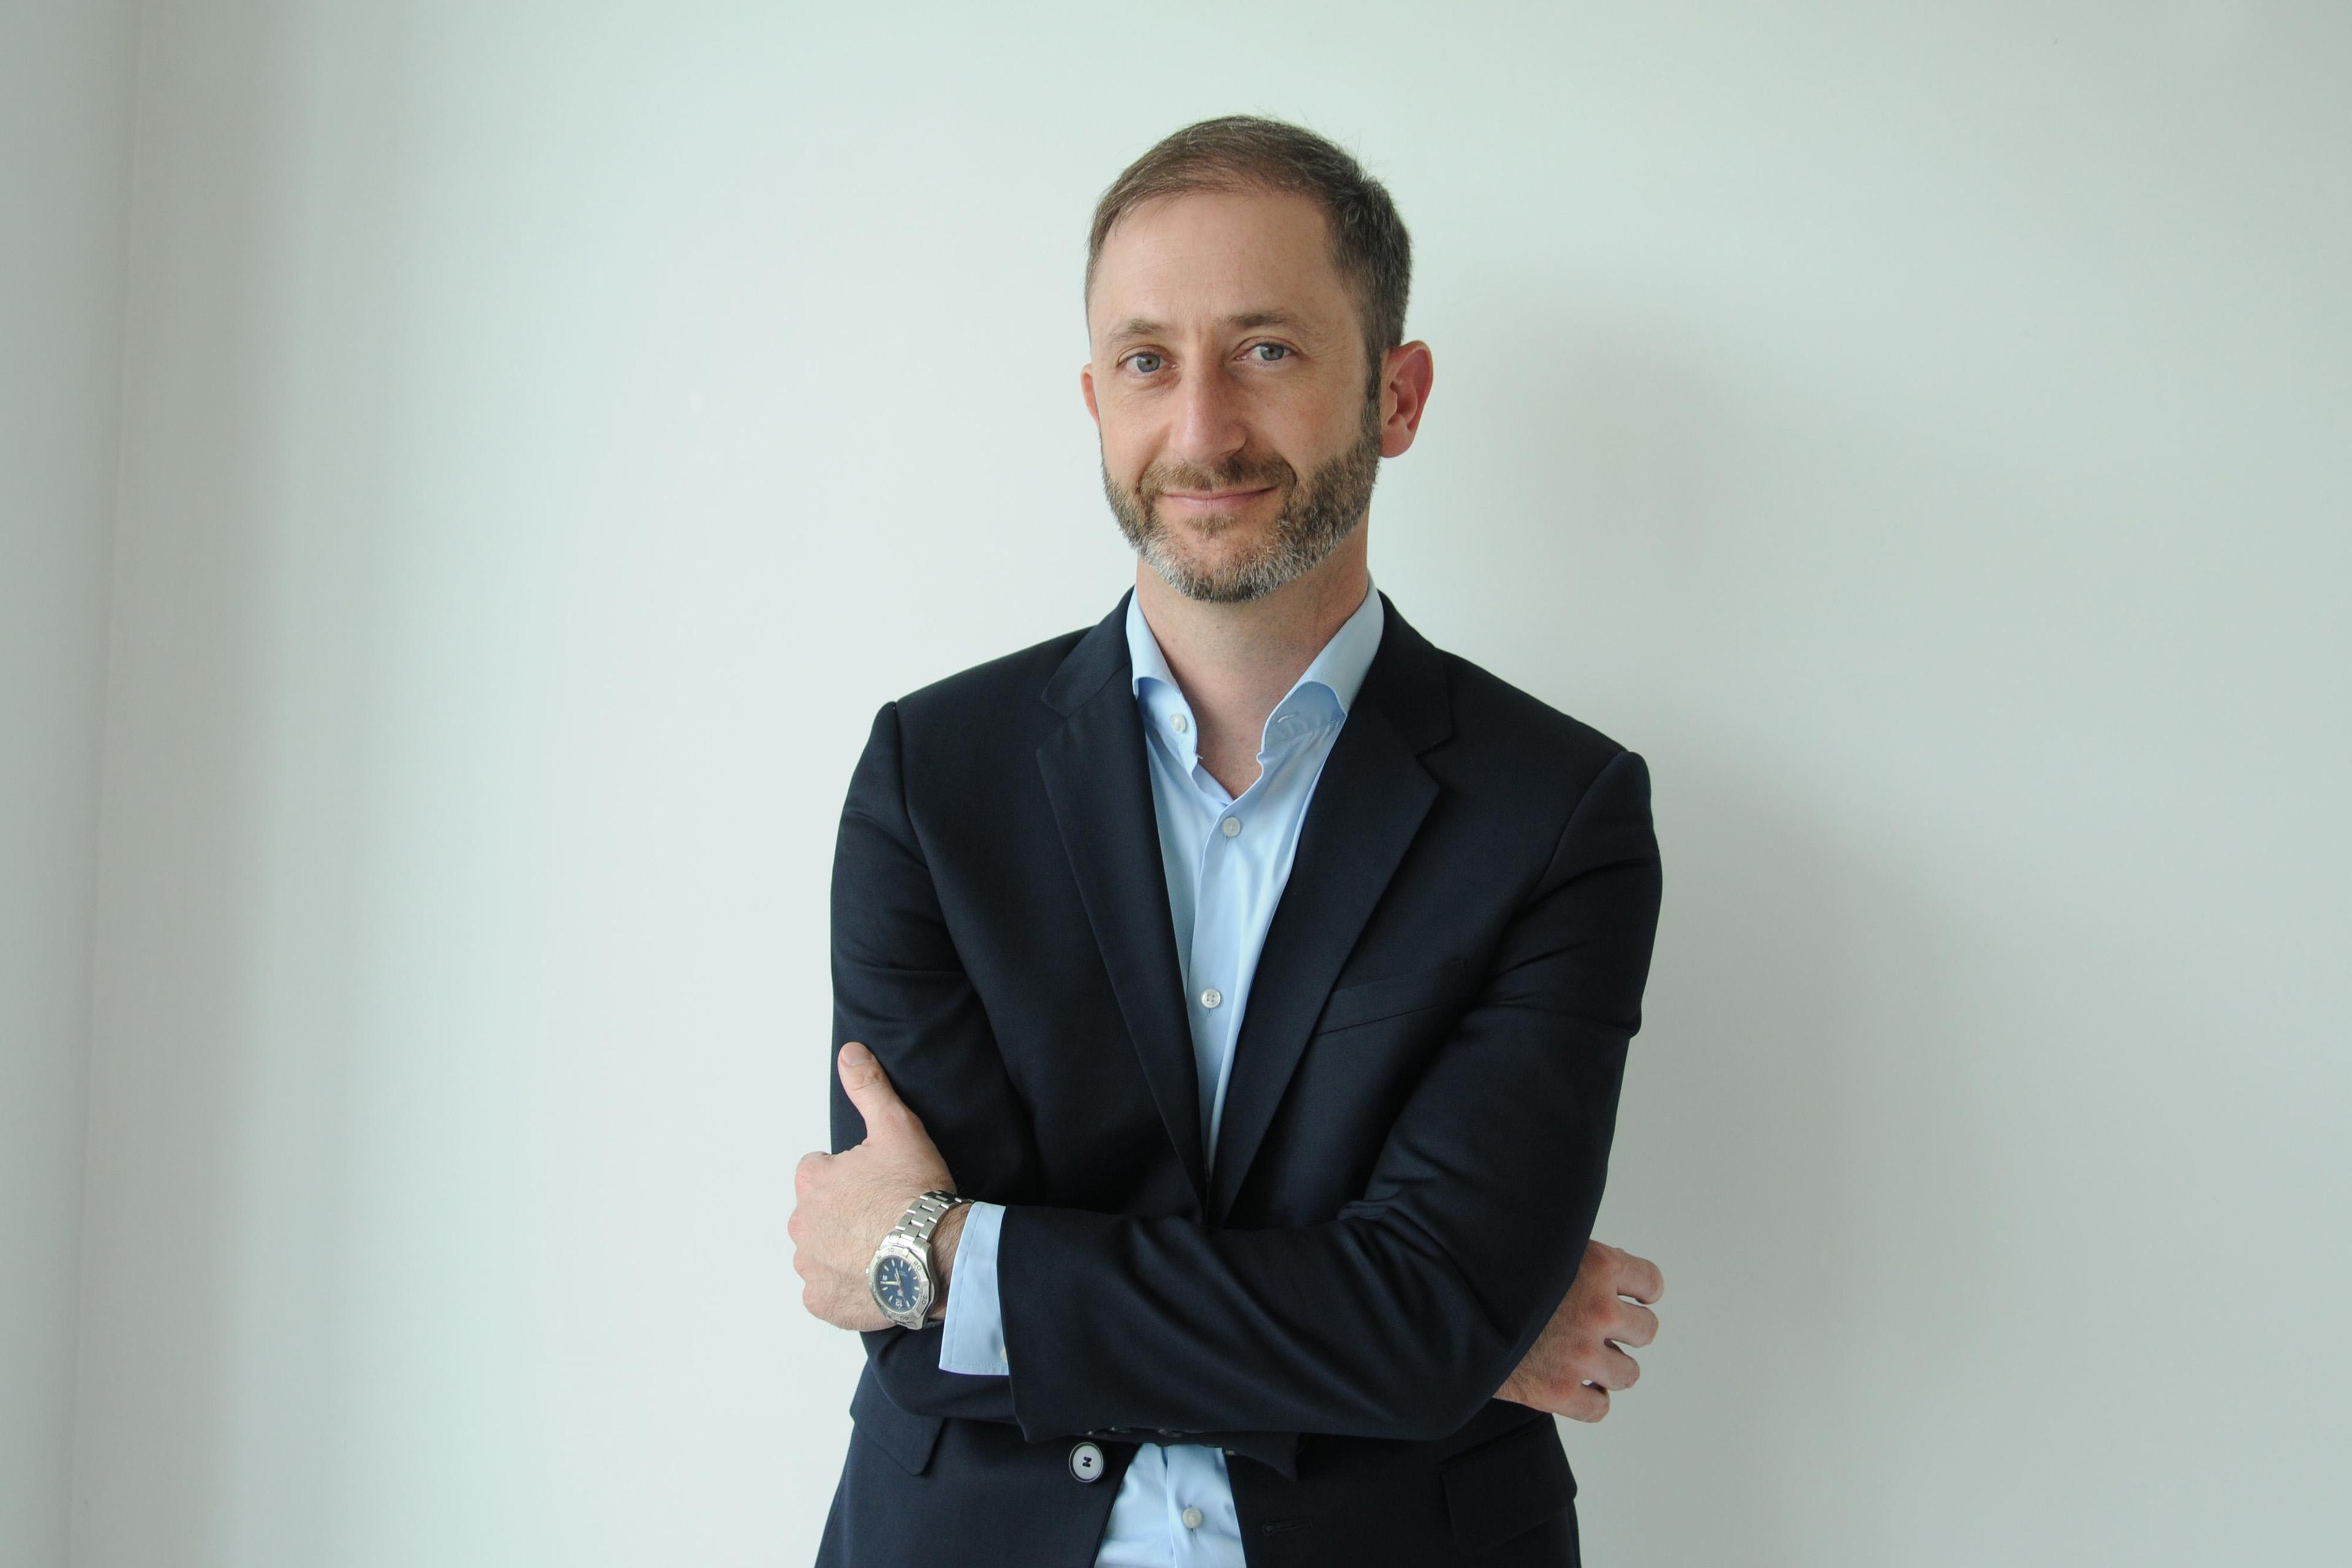 2019 Entrepreneur Federico Trucco